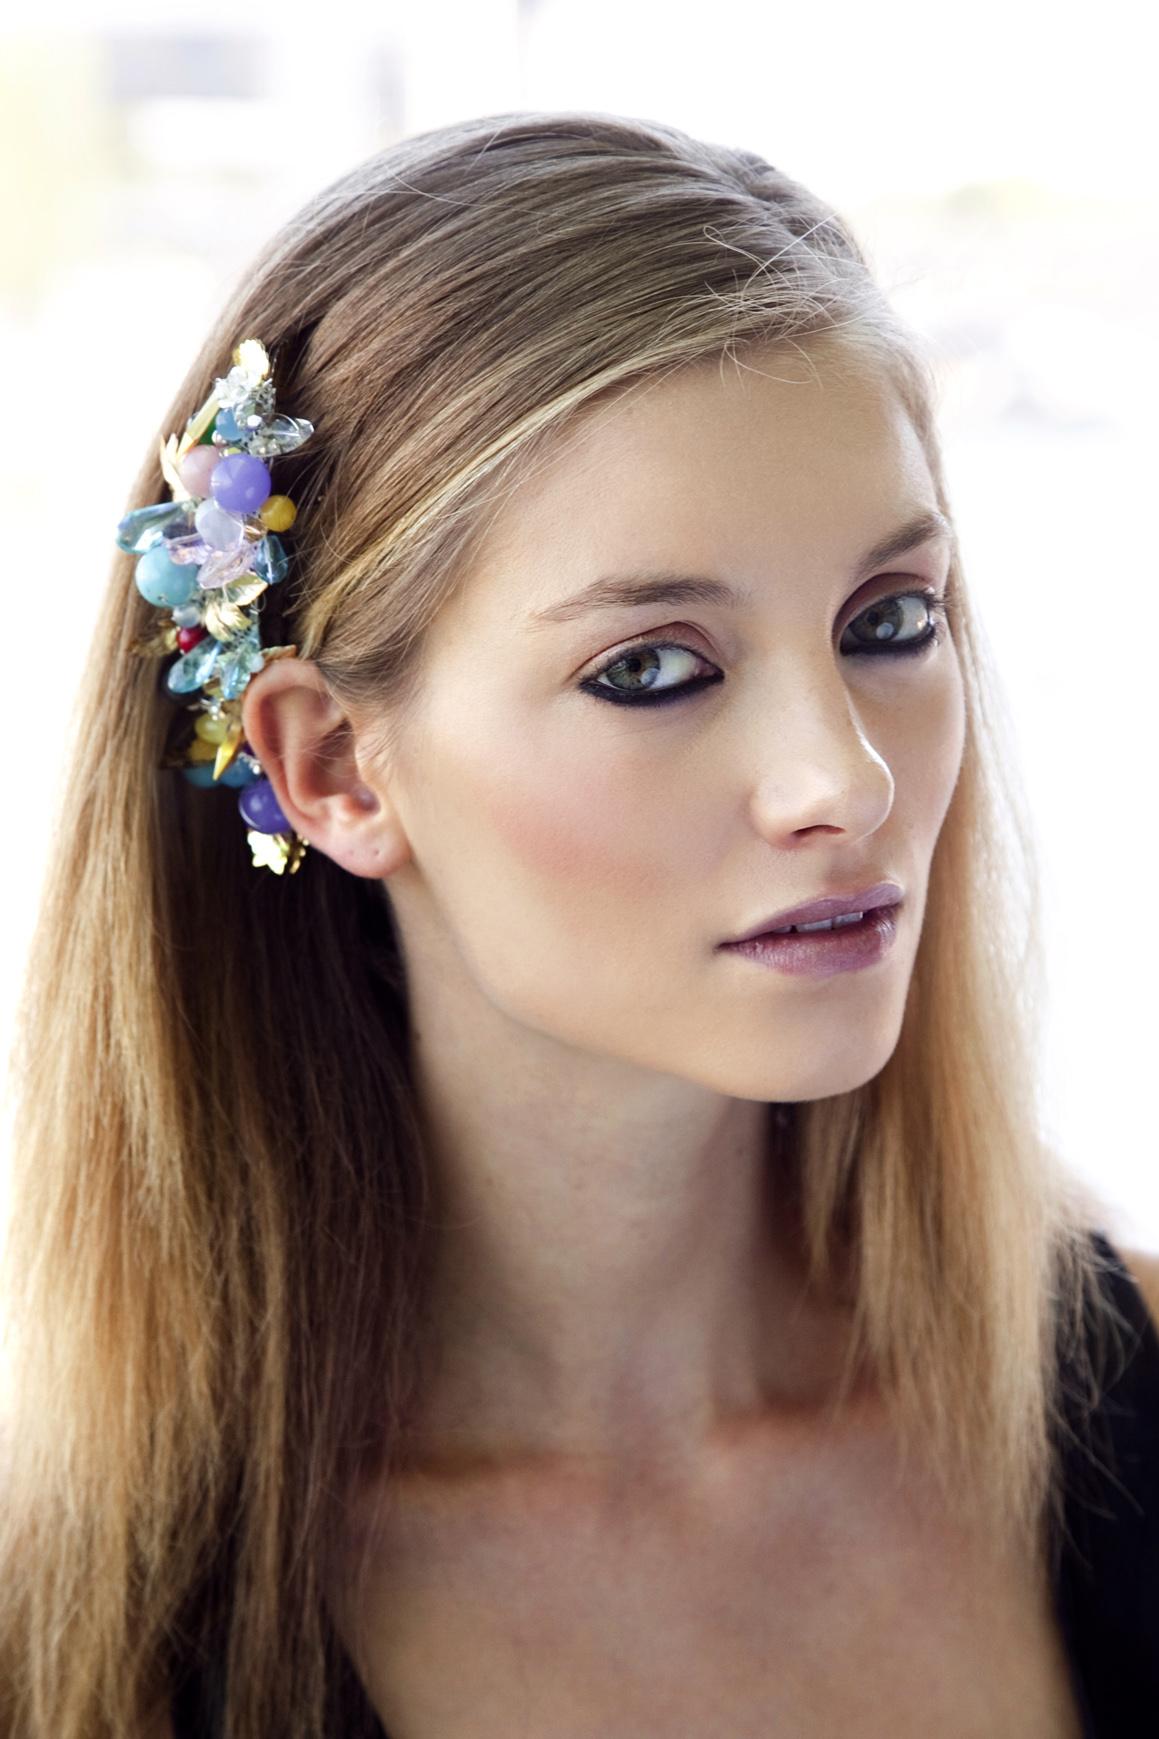 barrette hair accessory